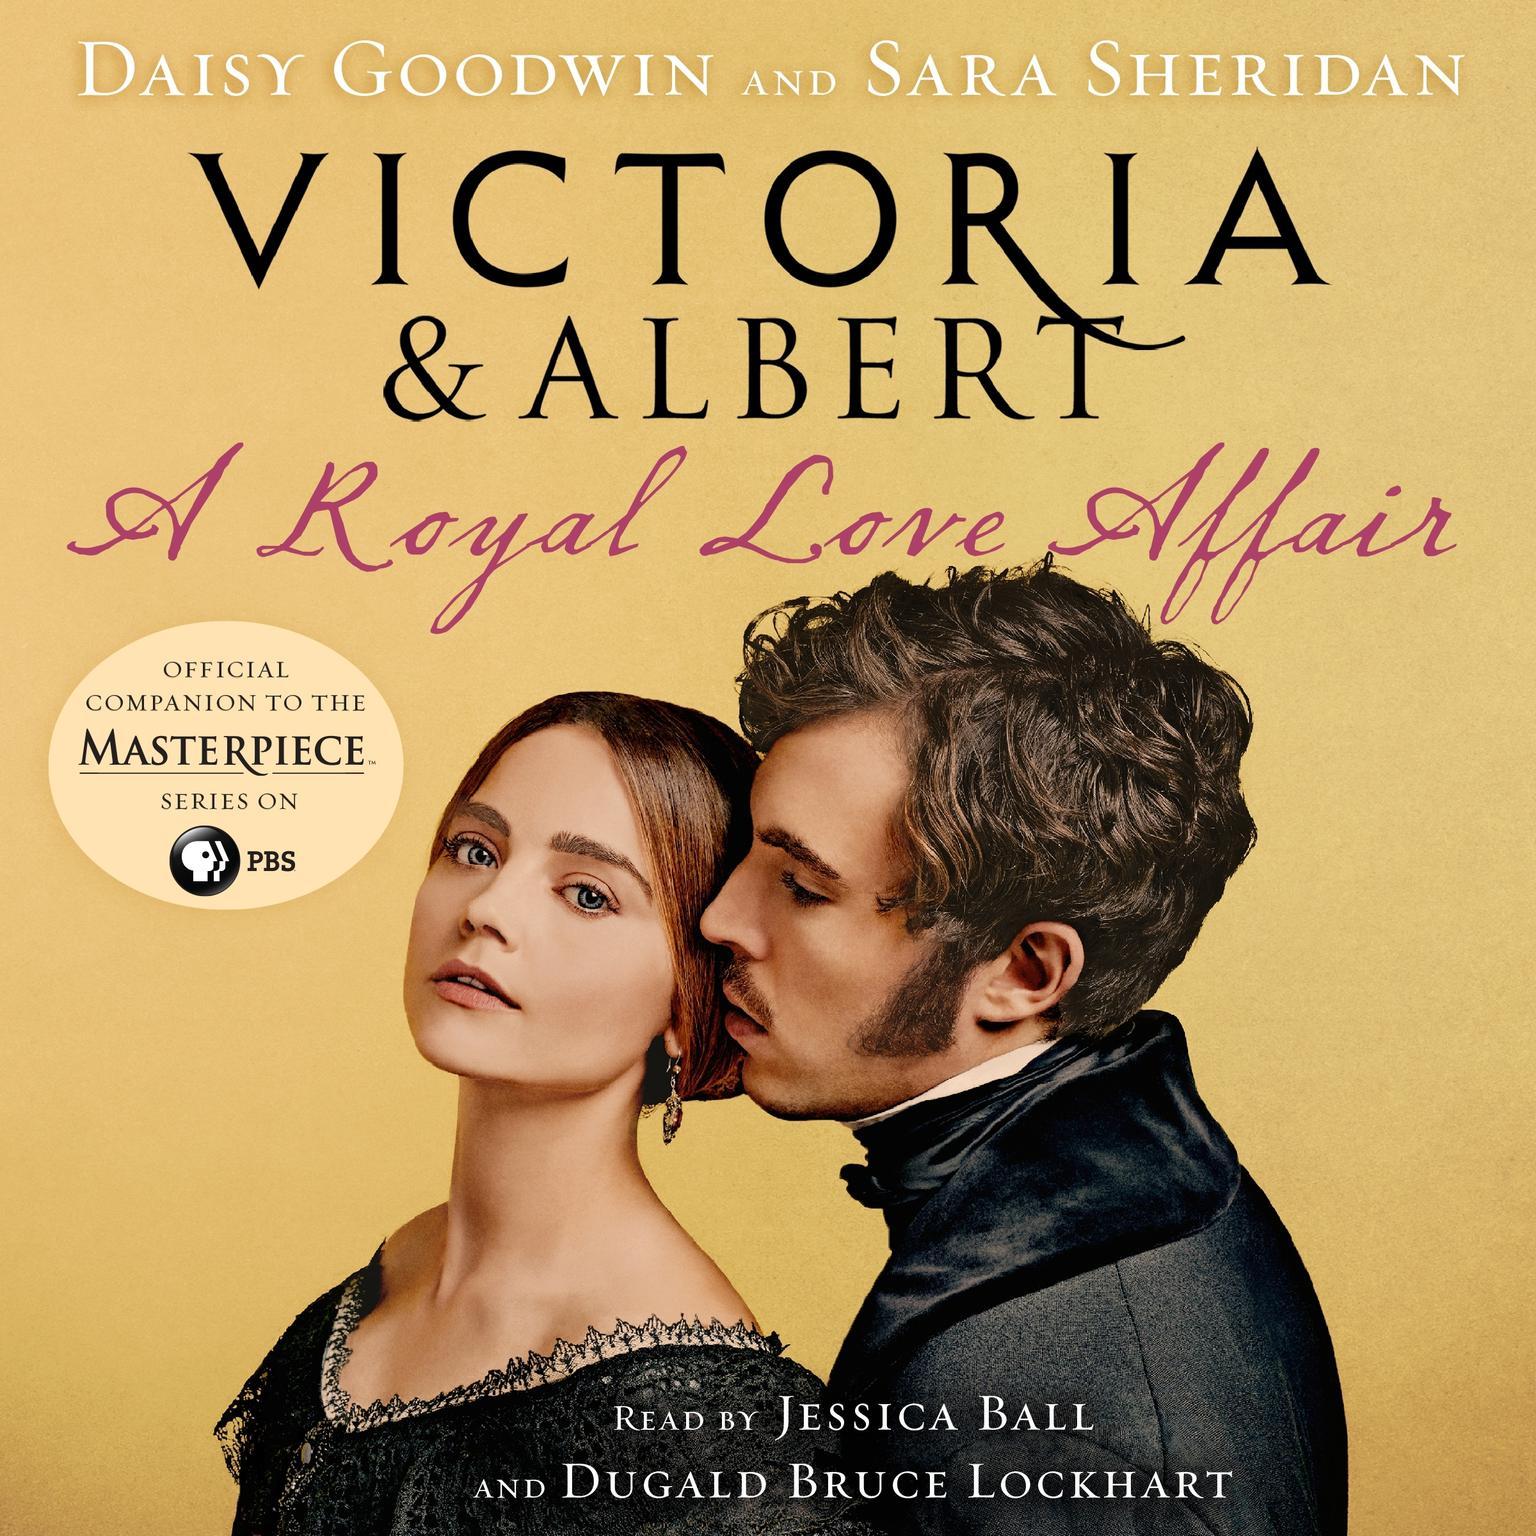 Victoria & Albert: A Royal Love Affair Audiobook, by Daisy Goodwin